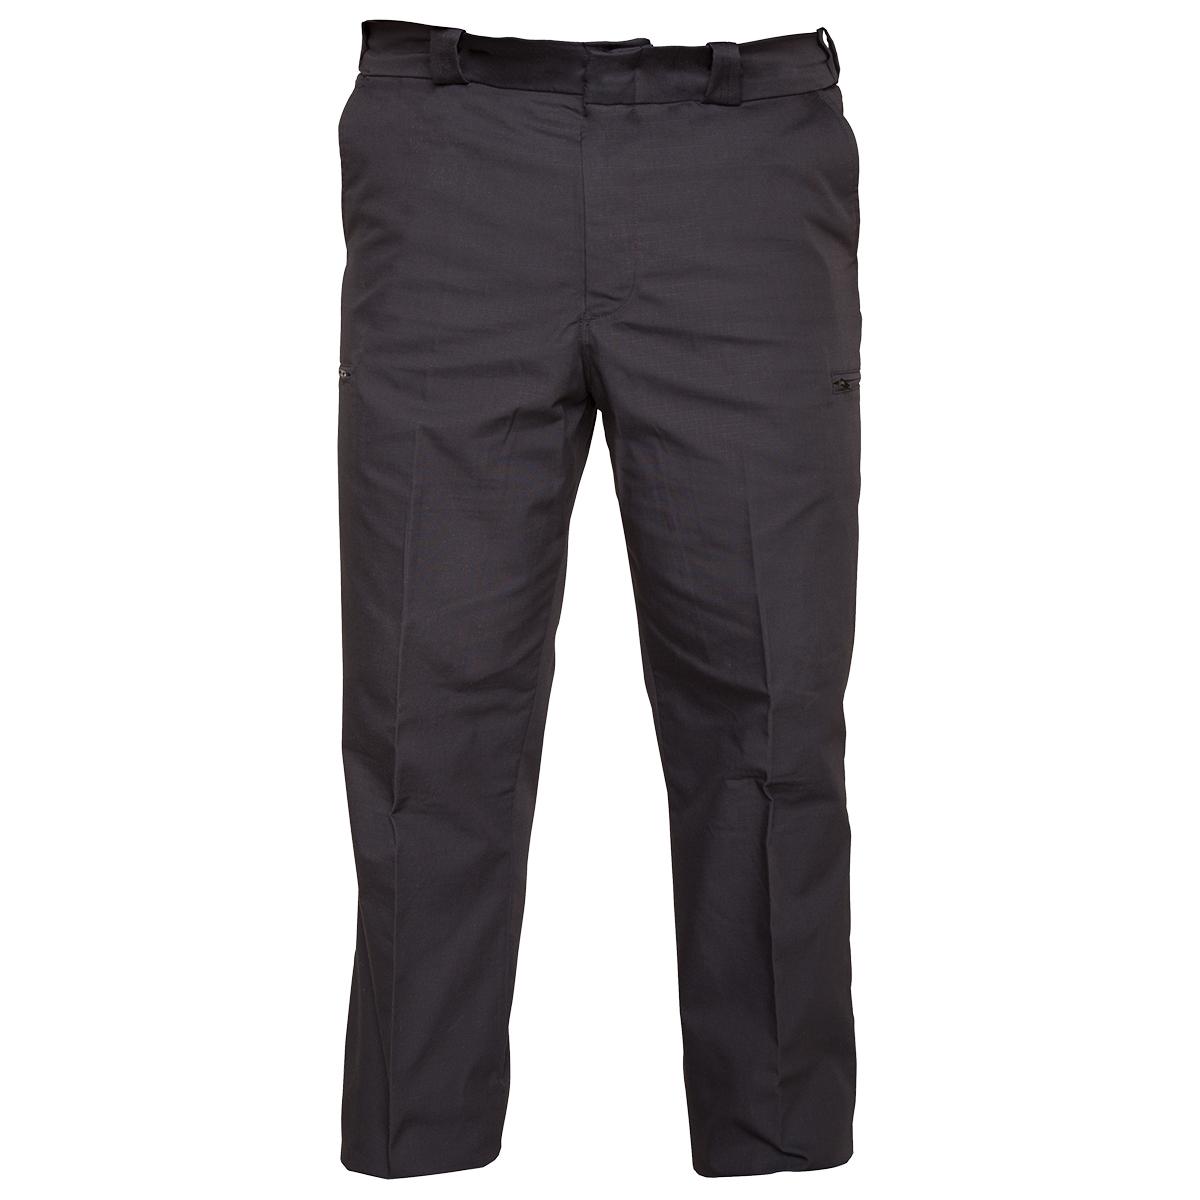 Reflex Covert Cargo Pants-Mens-Elbeco